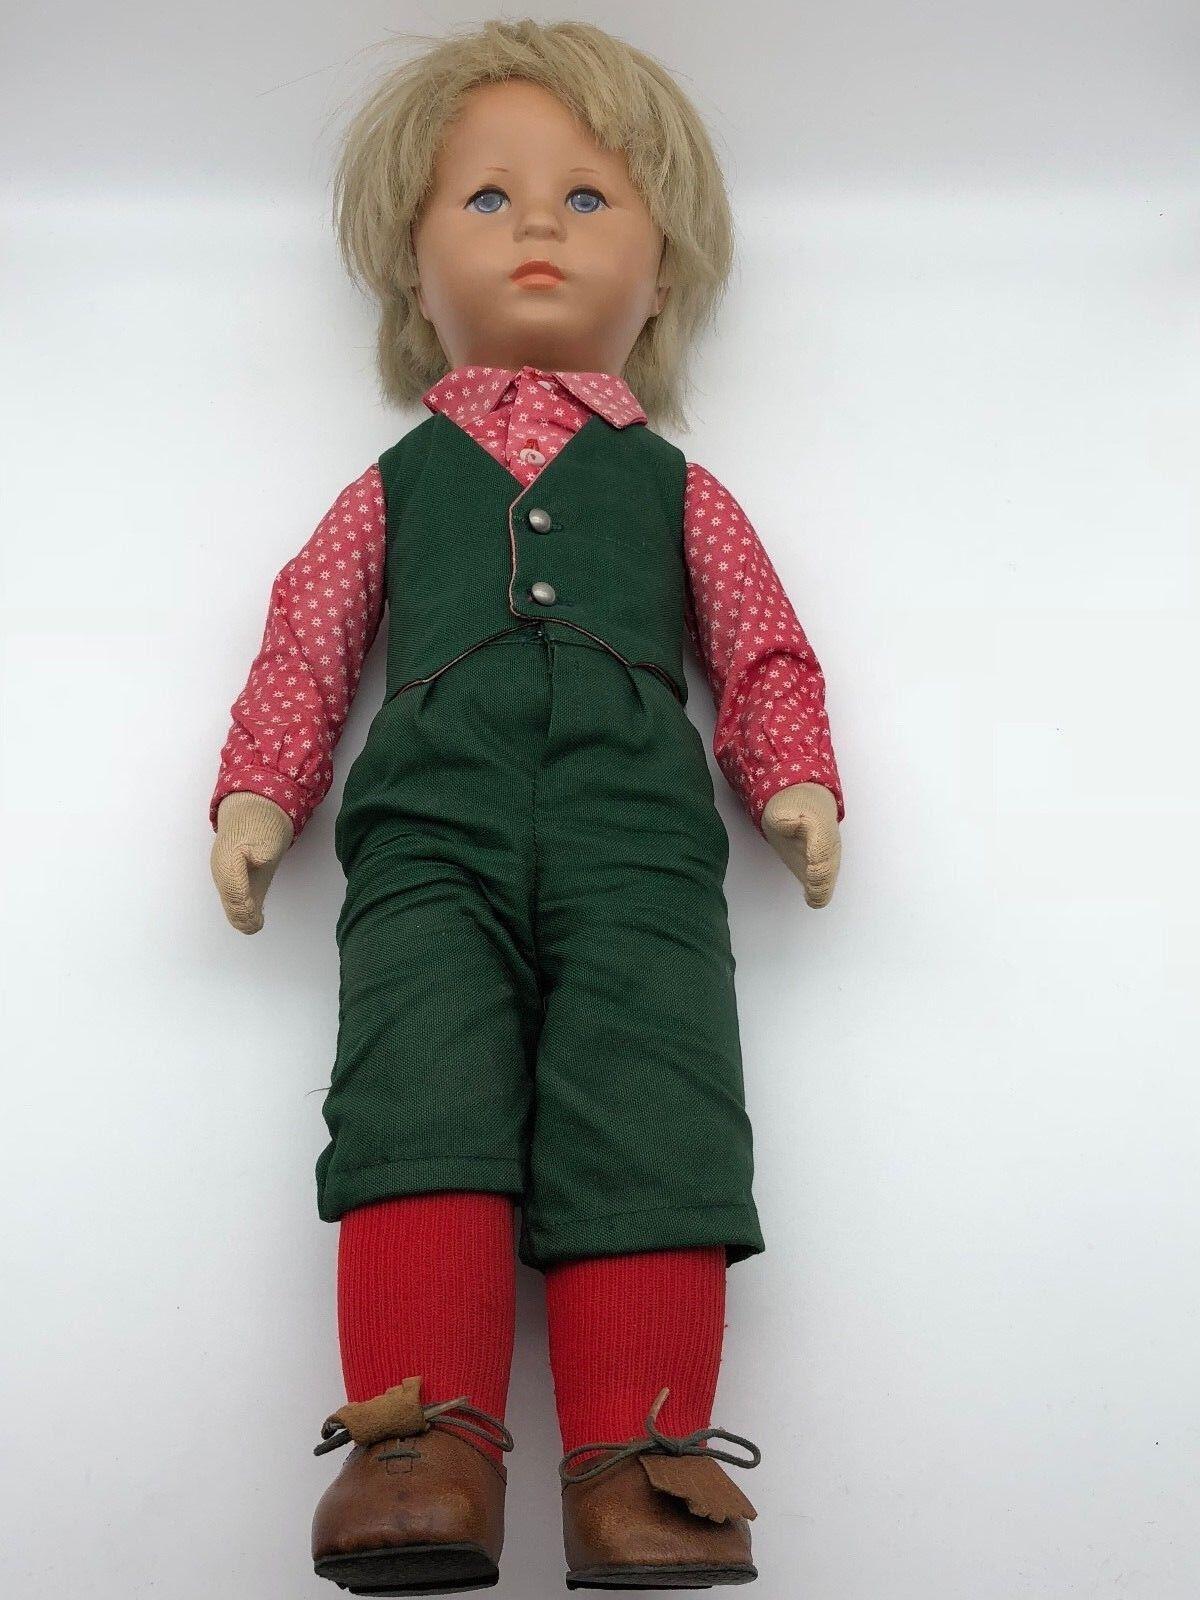 Vieja Jacinta Kruse muñeca 47 cm. top estado, ver fotos